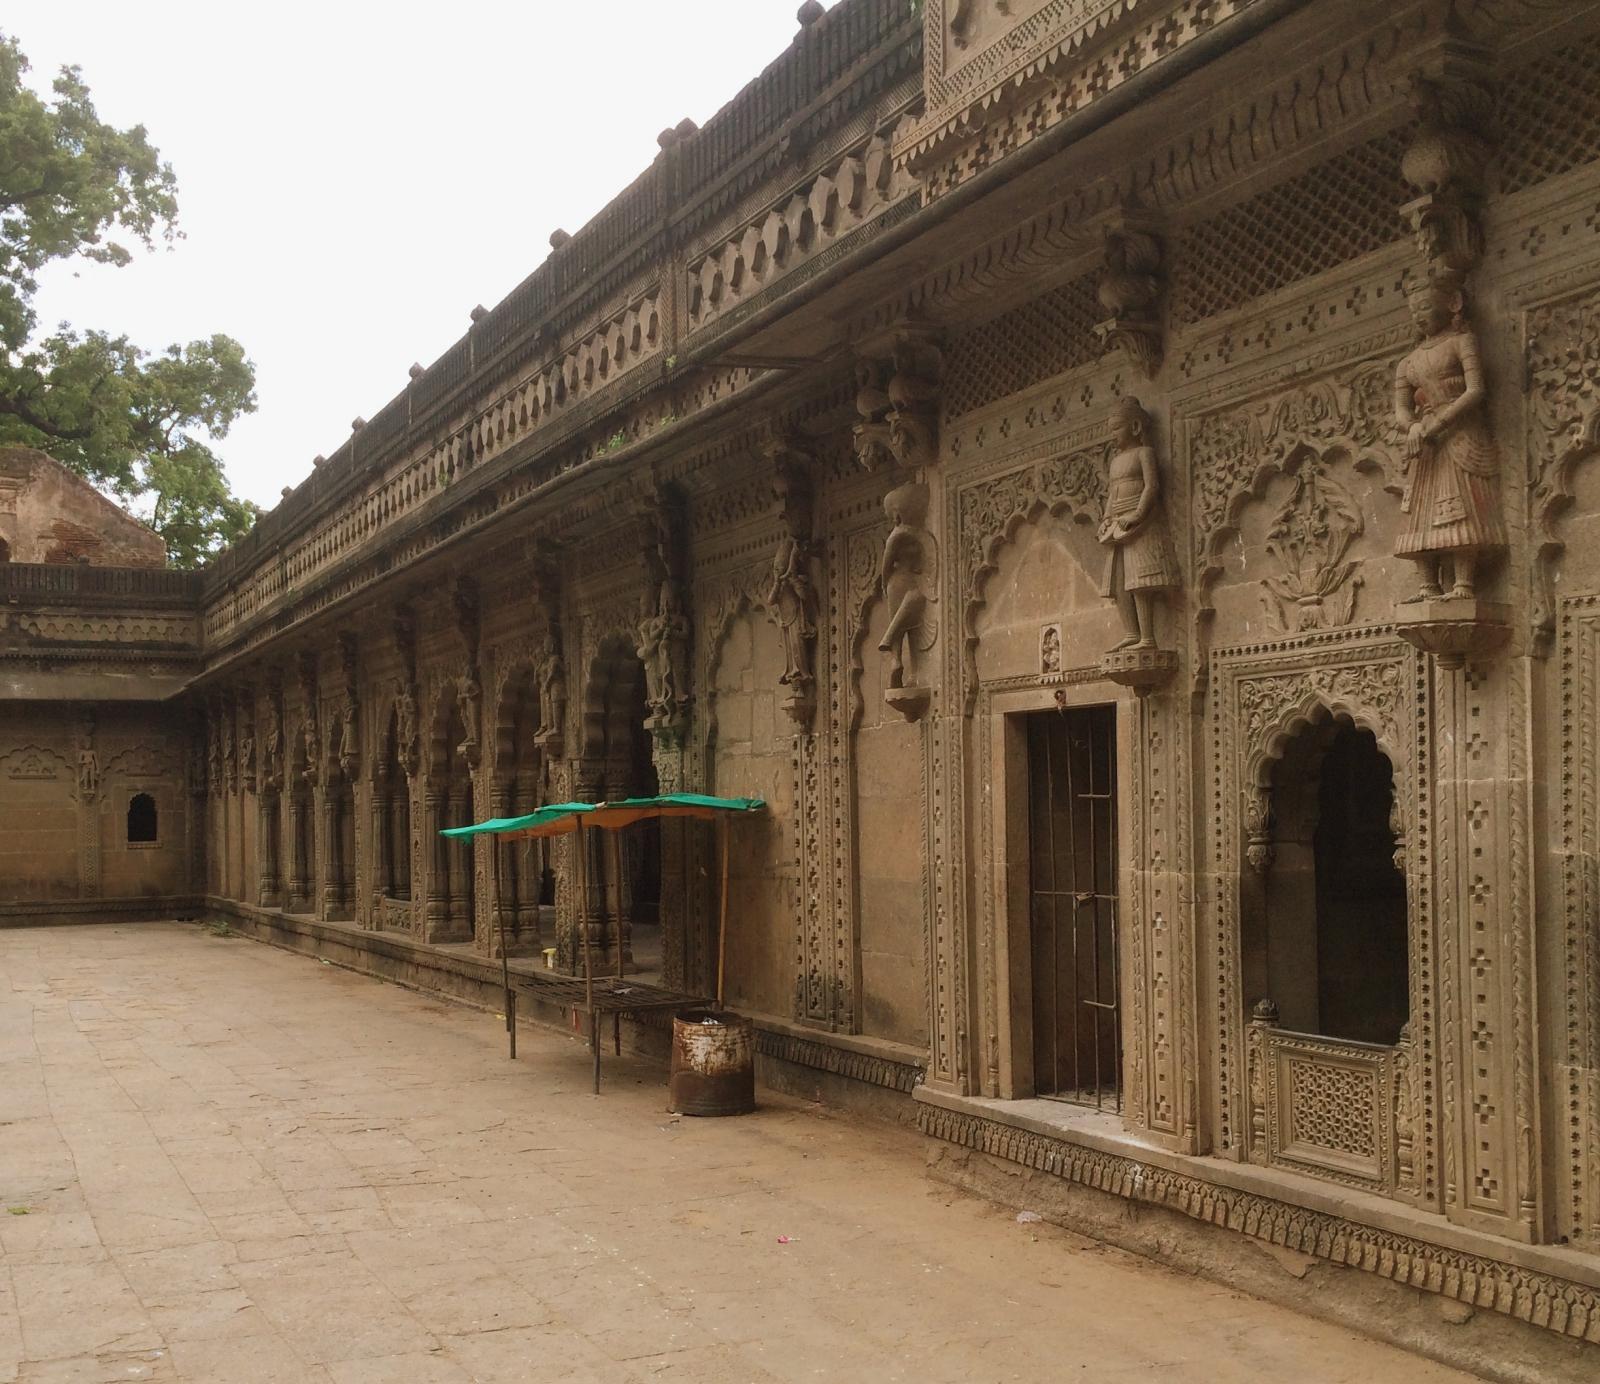 Ahilya Fort Wall Carvings